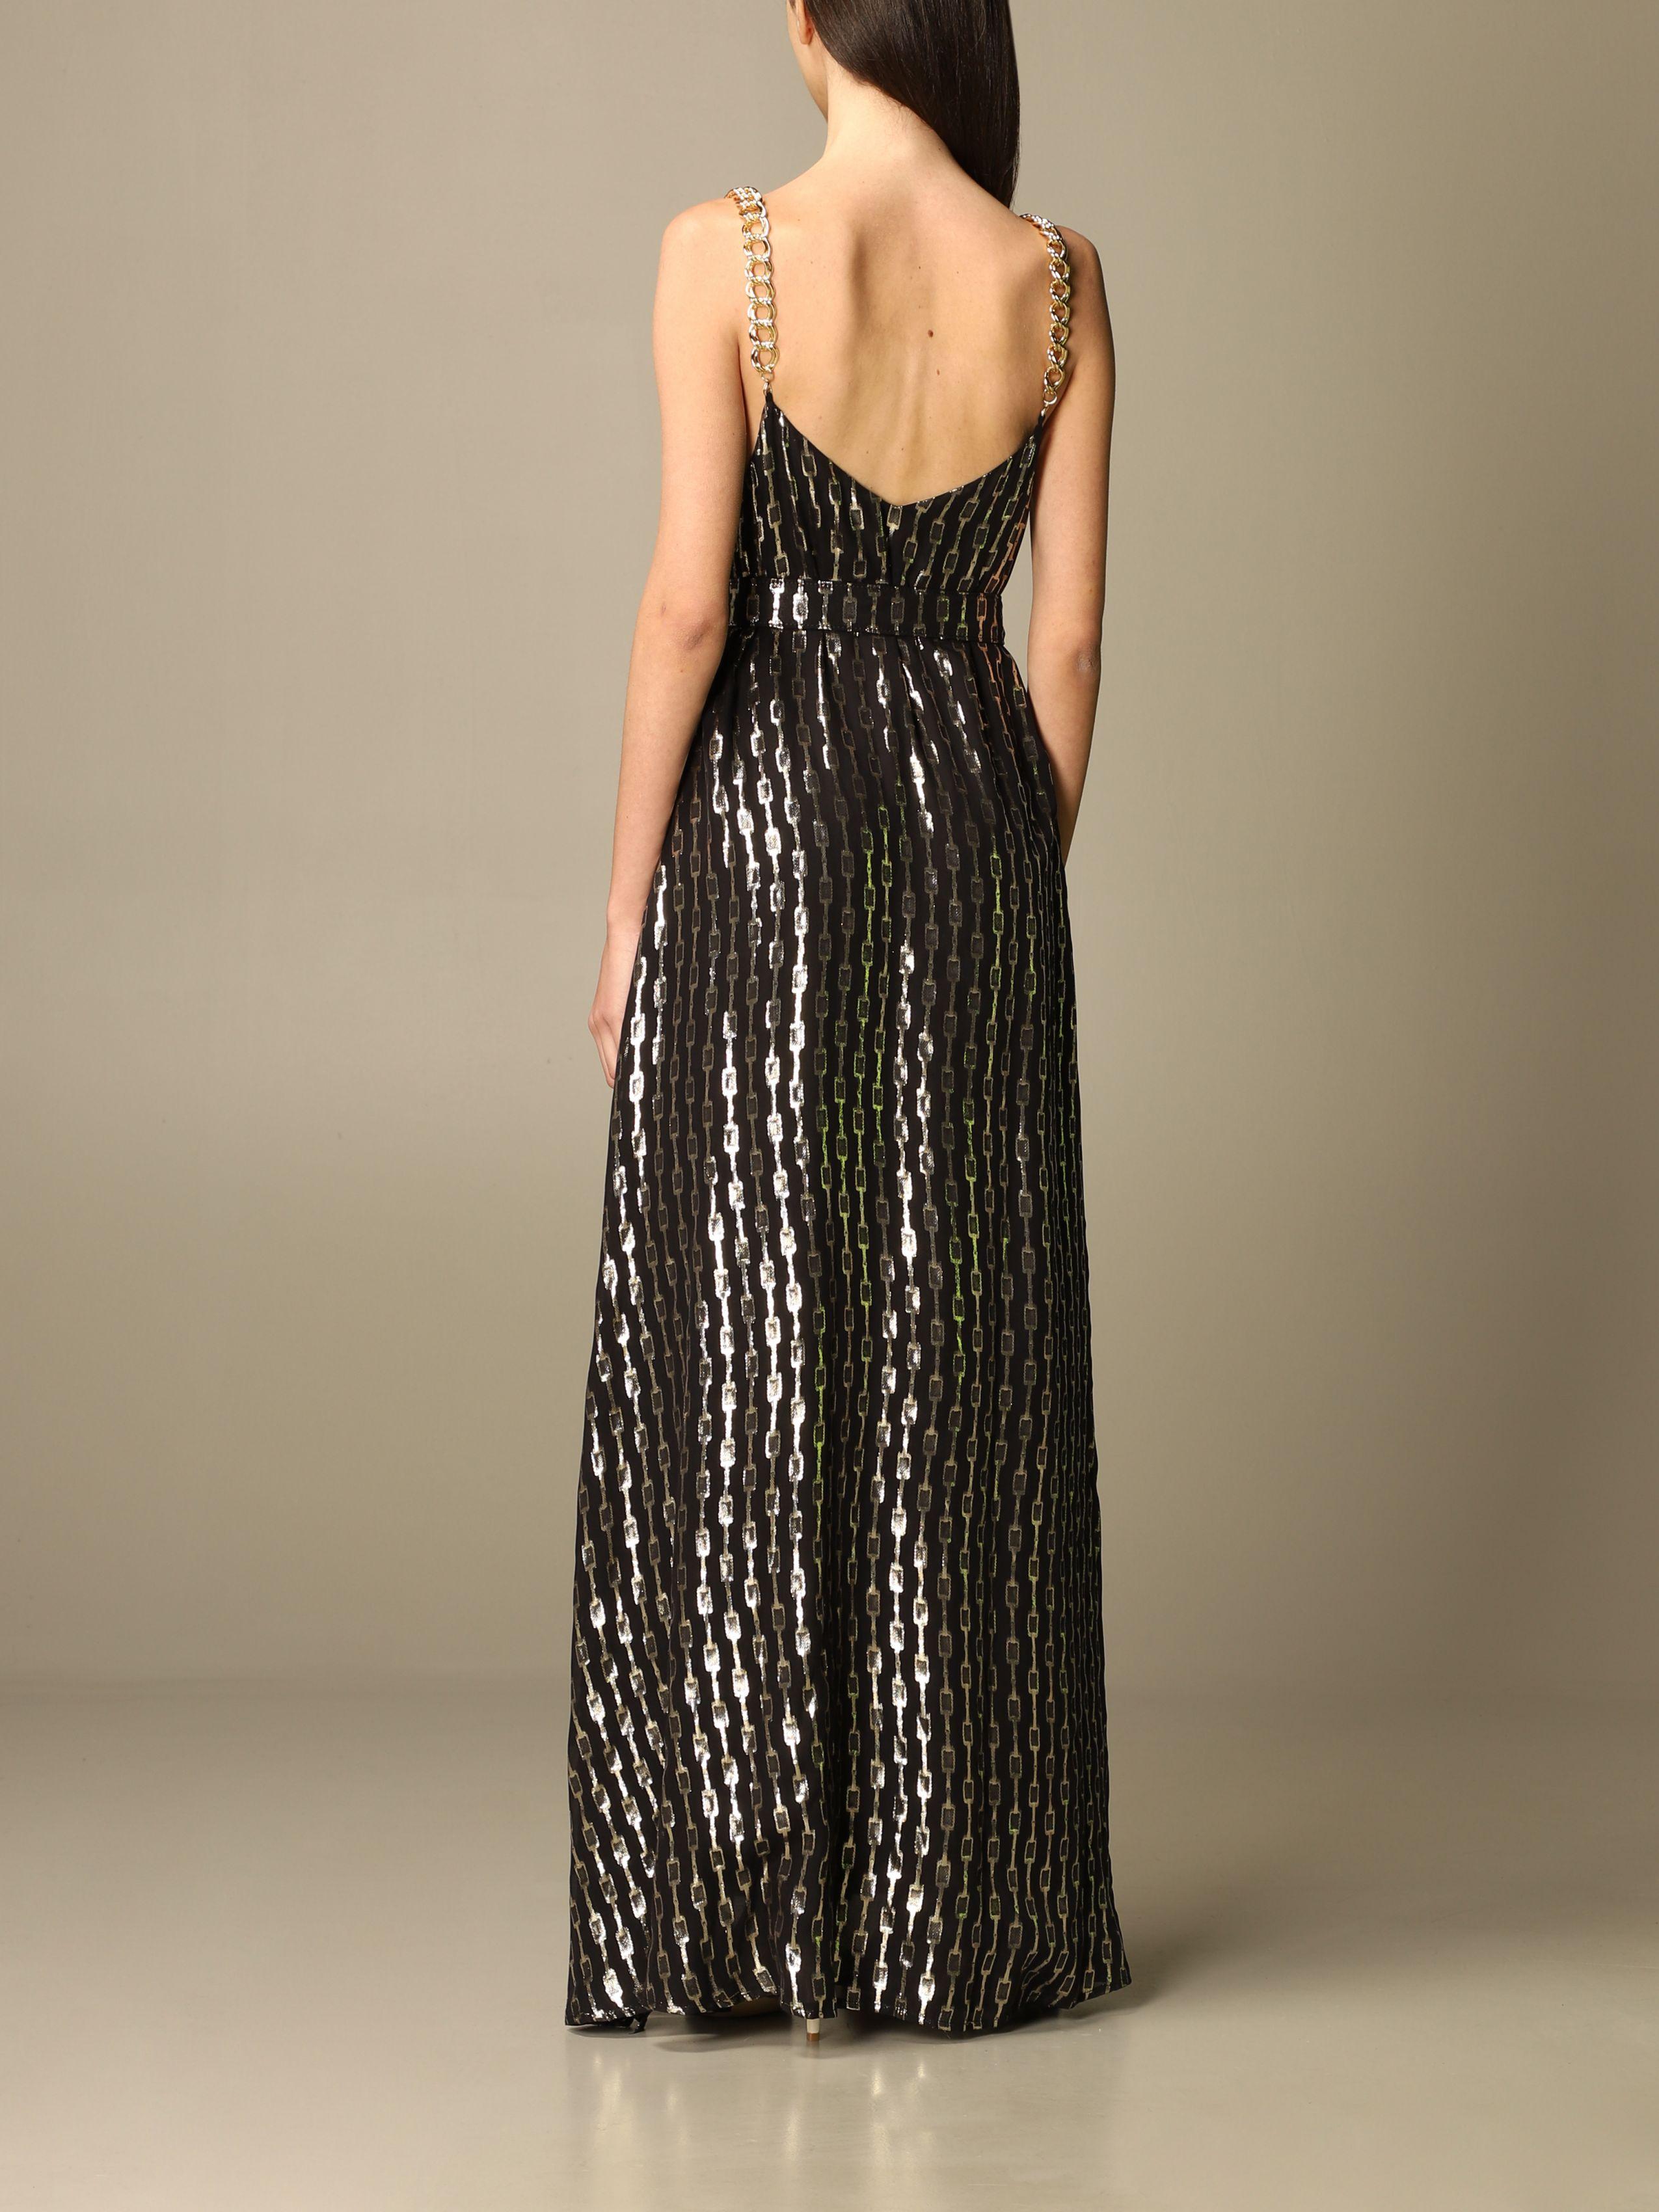 SIMONA CORSELLINI | Dresses | P21CPAB0170003